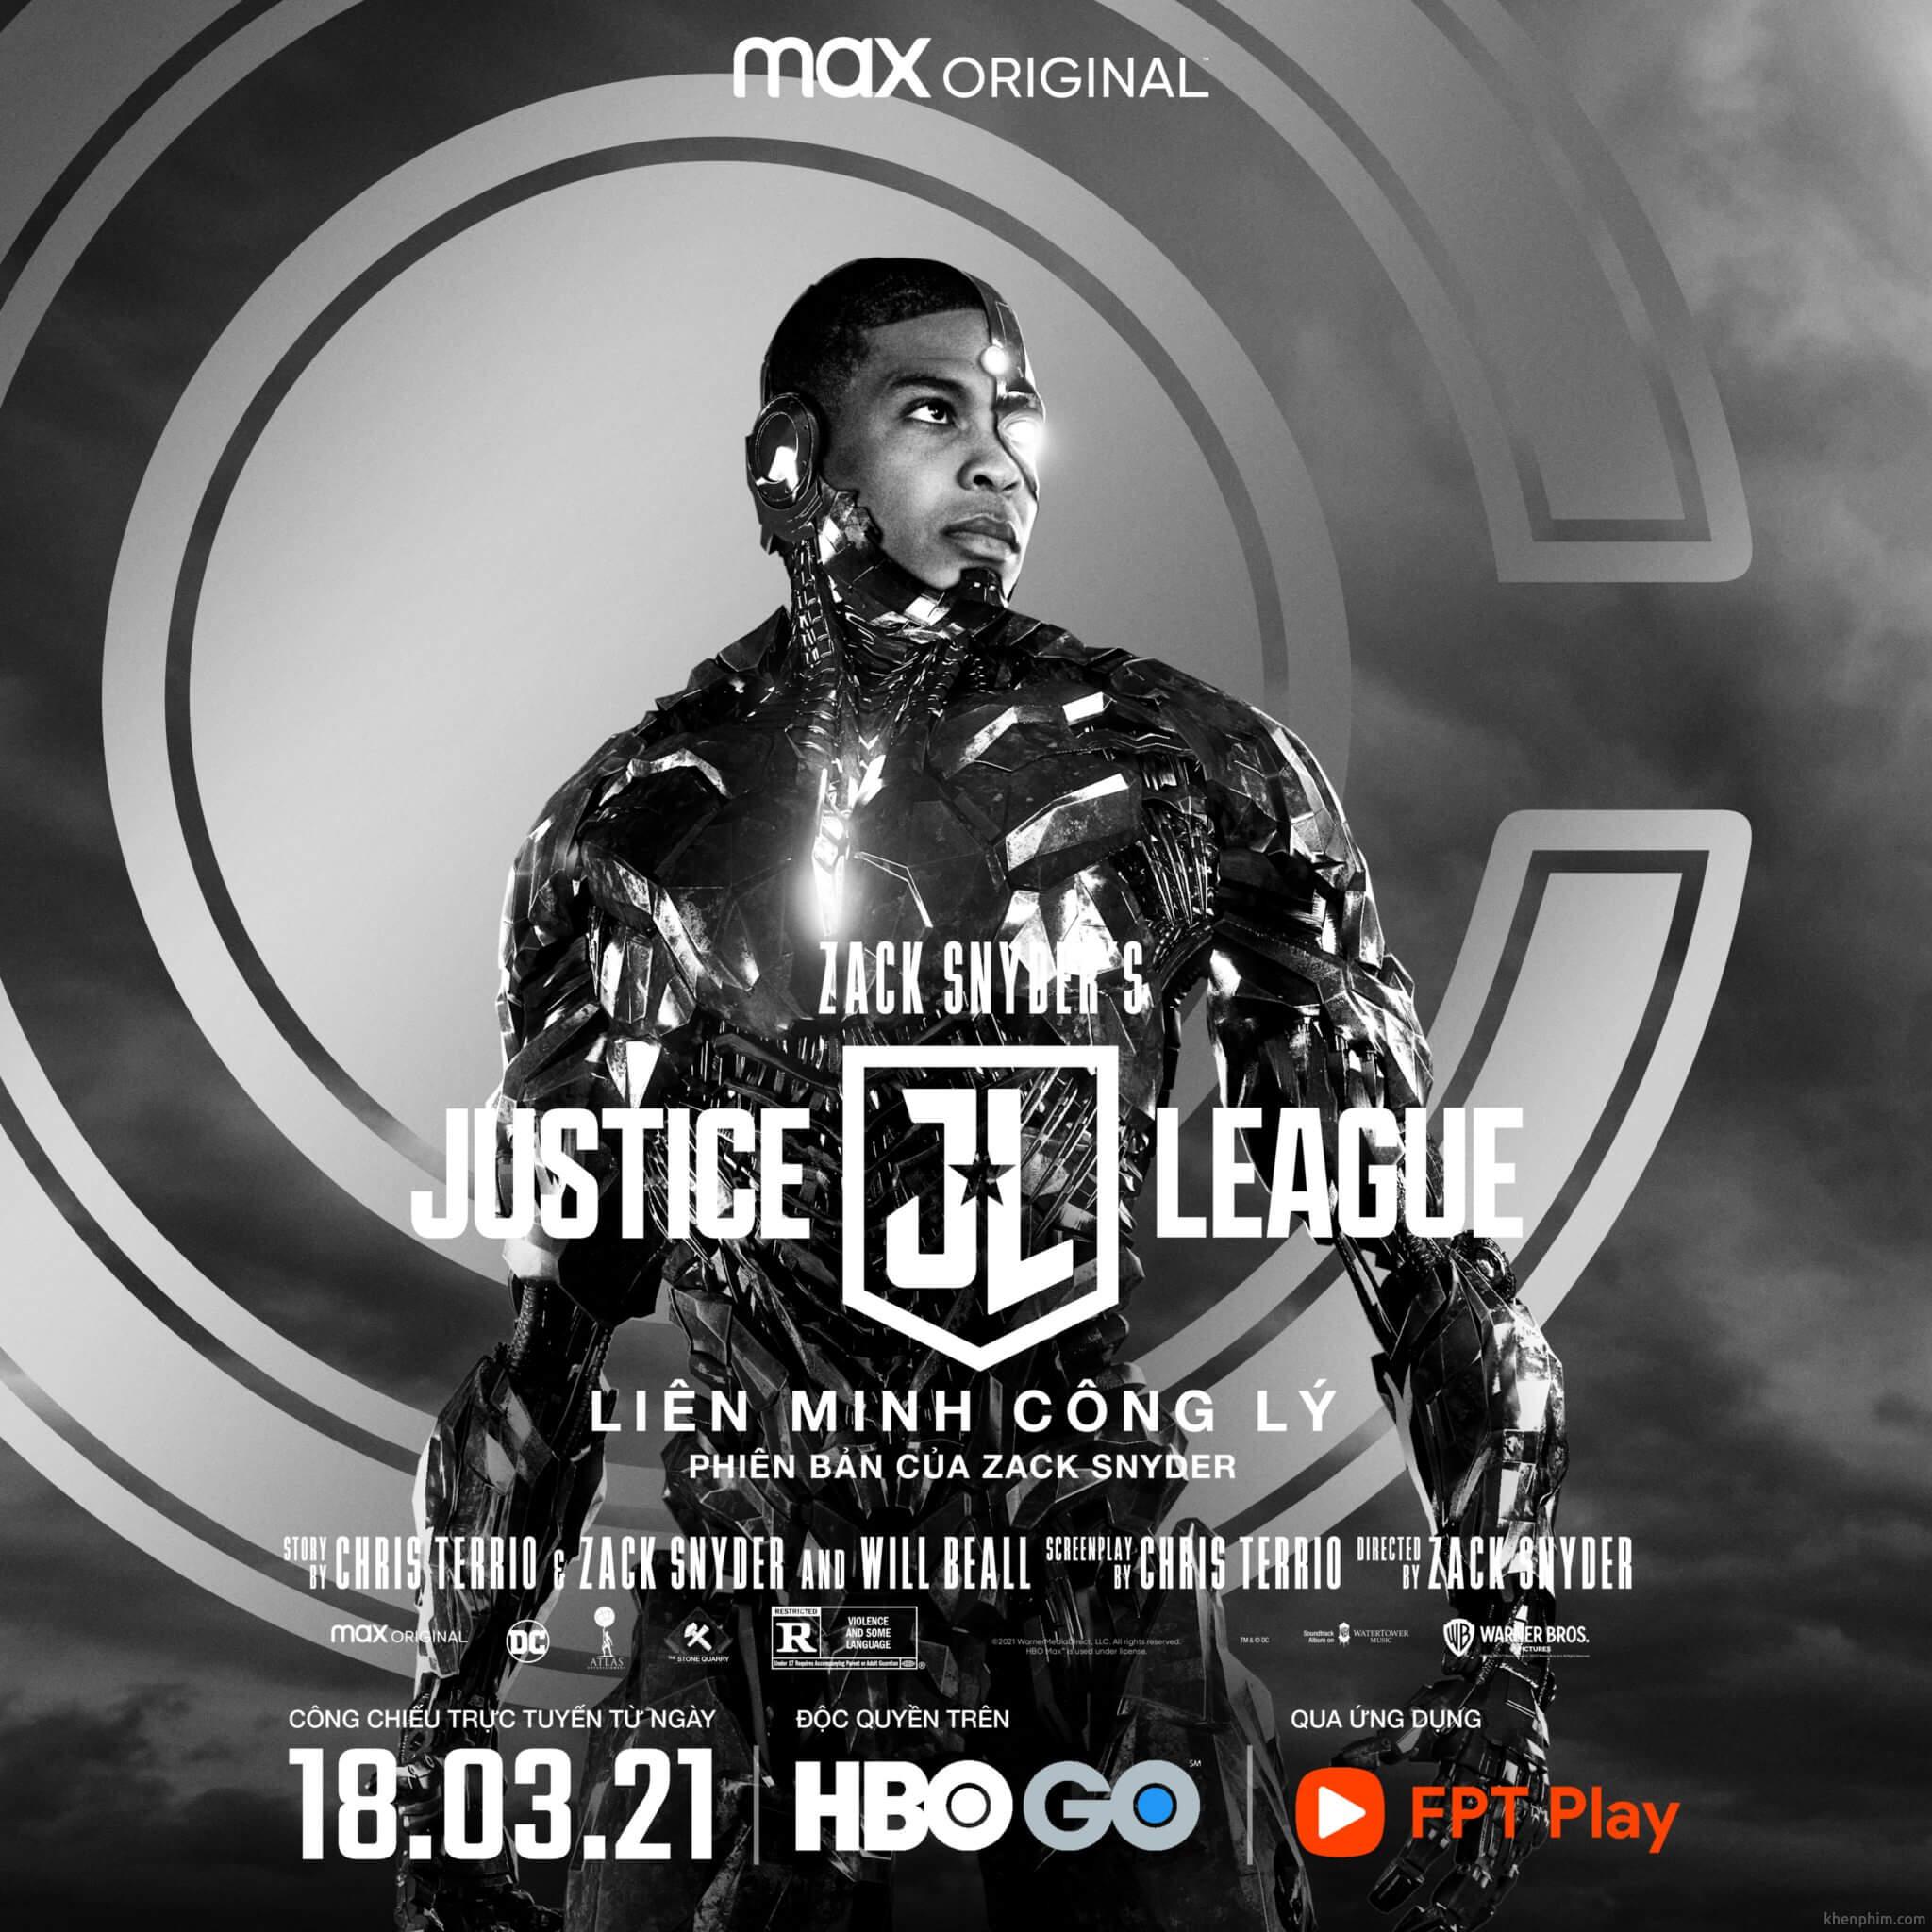 Poster nhân vật trong phim Zack Snyder's Justice League - League Cyborg